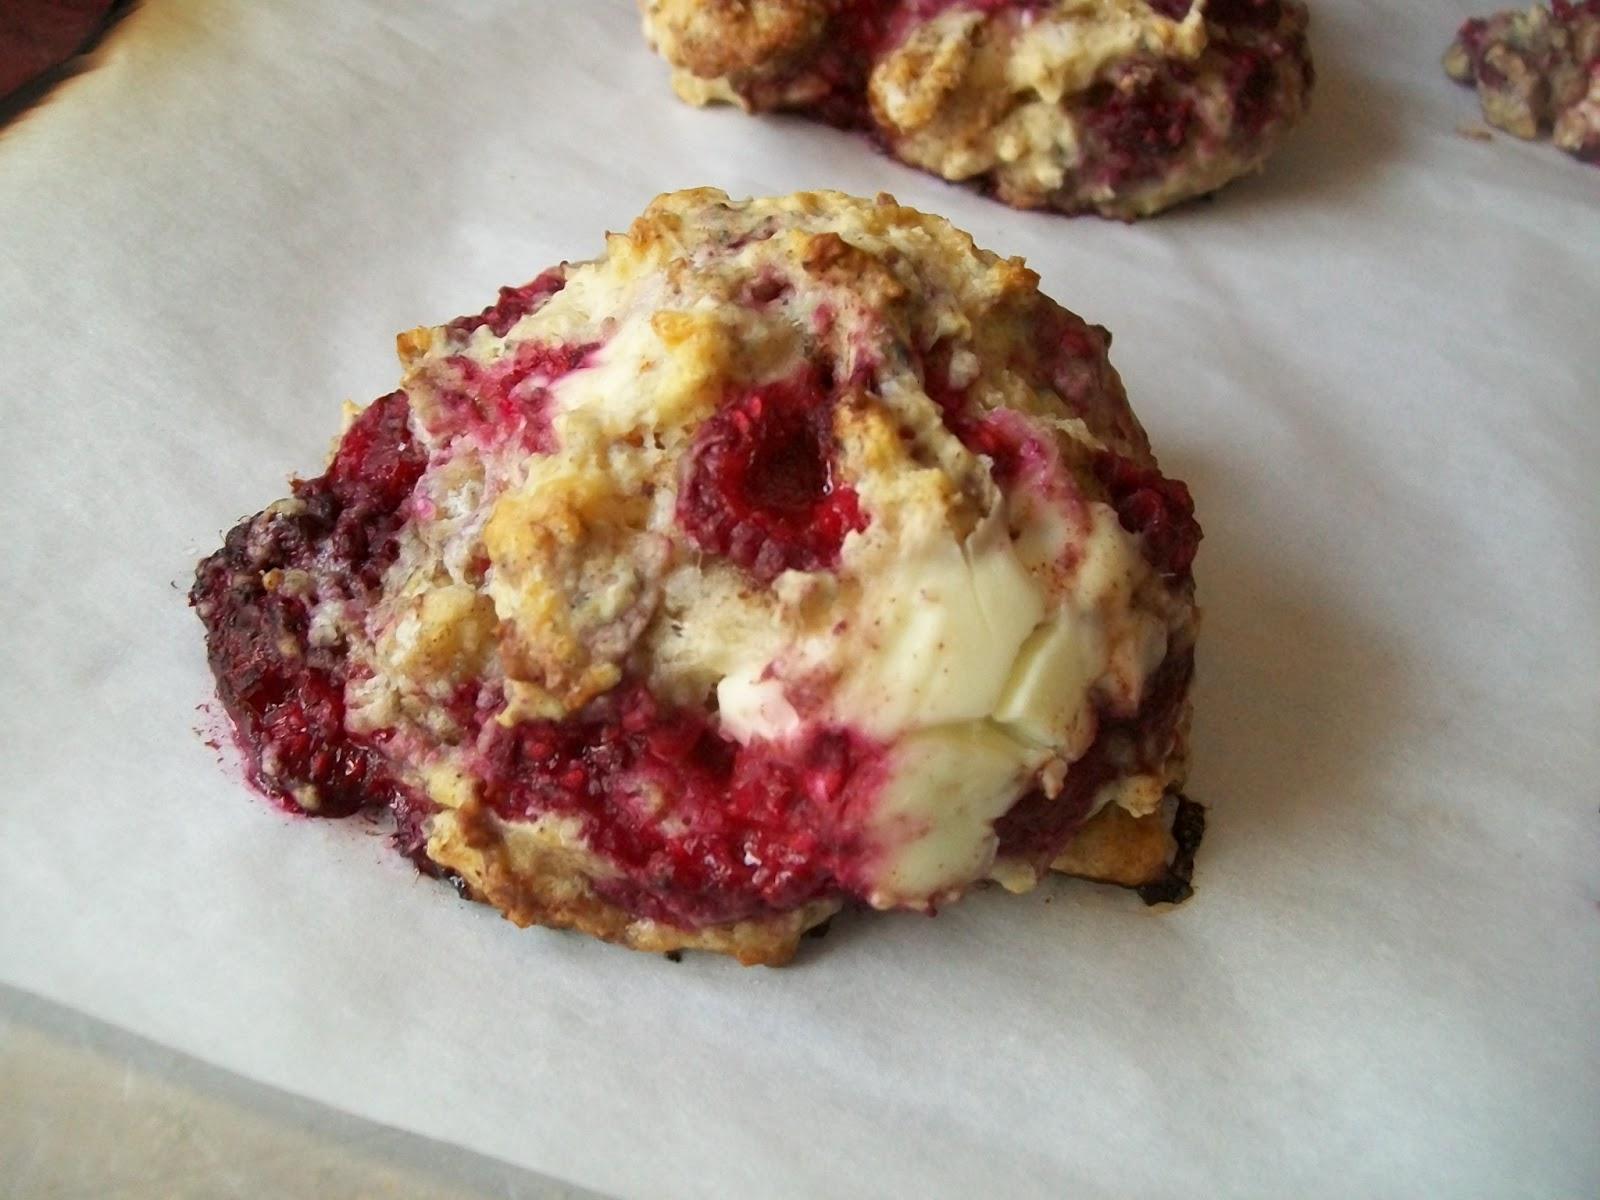 My copy-cat Great Harvest Raspberry Cream Cheese Scone. The scones are ...